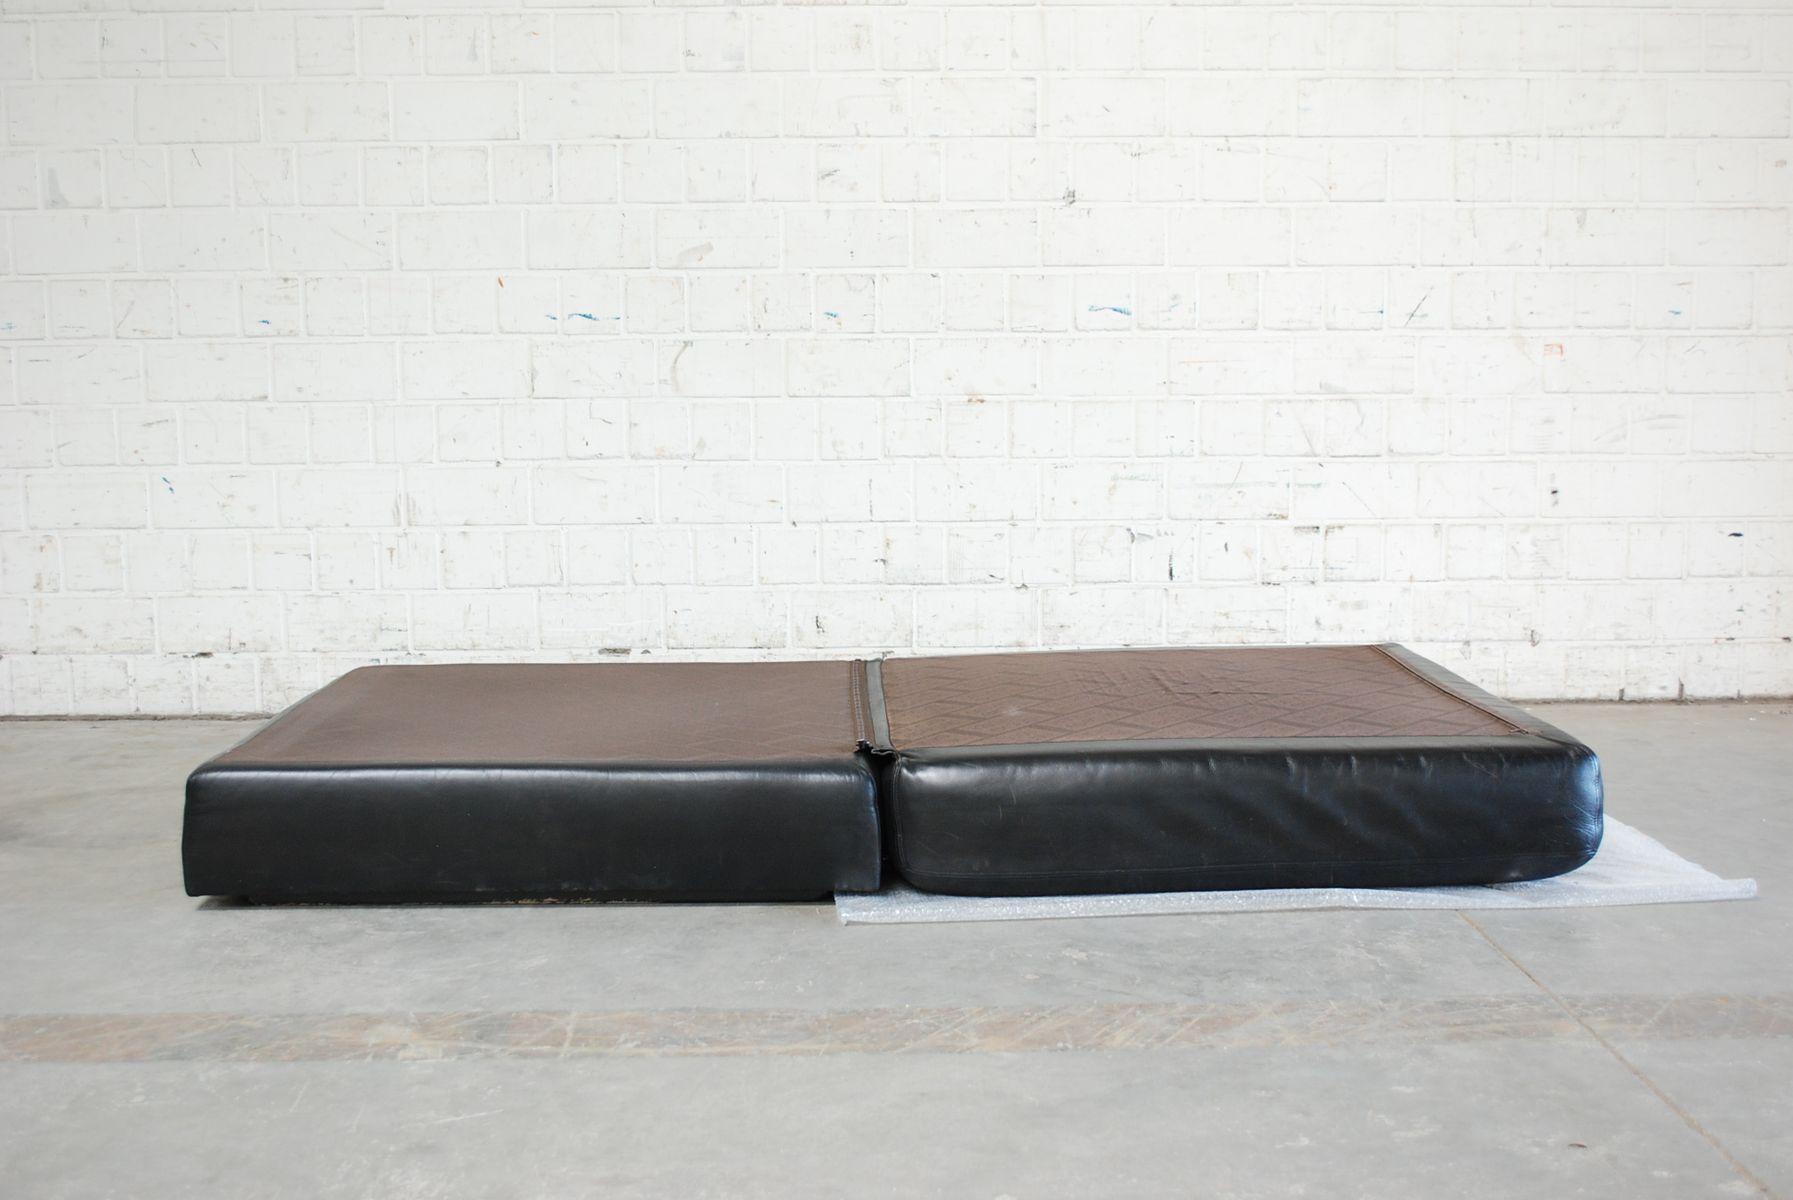 vintage ds 76 black leather pouf or daybed from de sede for sale at pamono. Black Bedroom Furniture Sets. Home Design Ideas